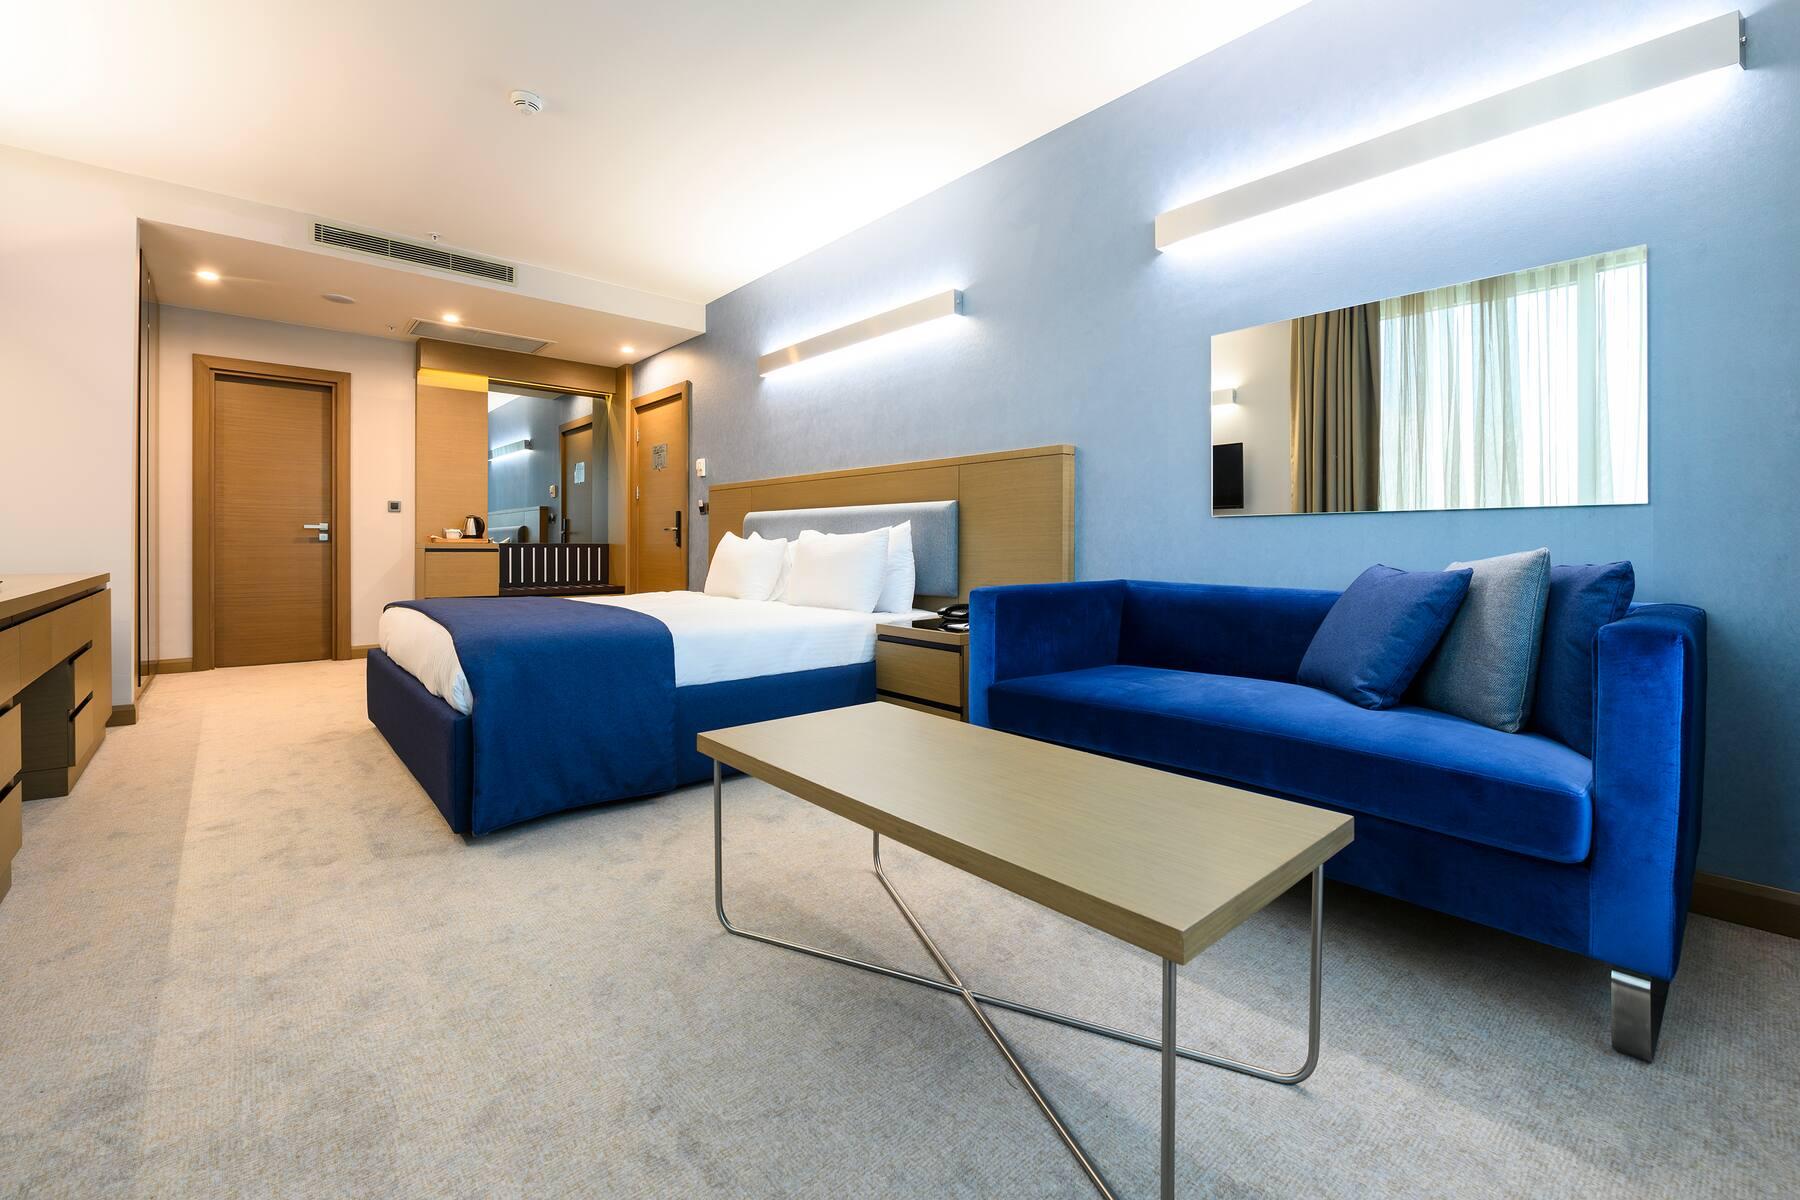 Revelion 2021 Istanbul - La Quinta Hotel 4* by Wyndham